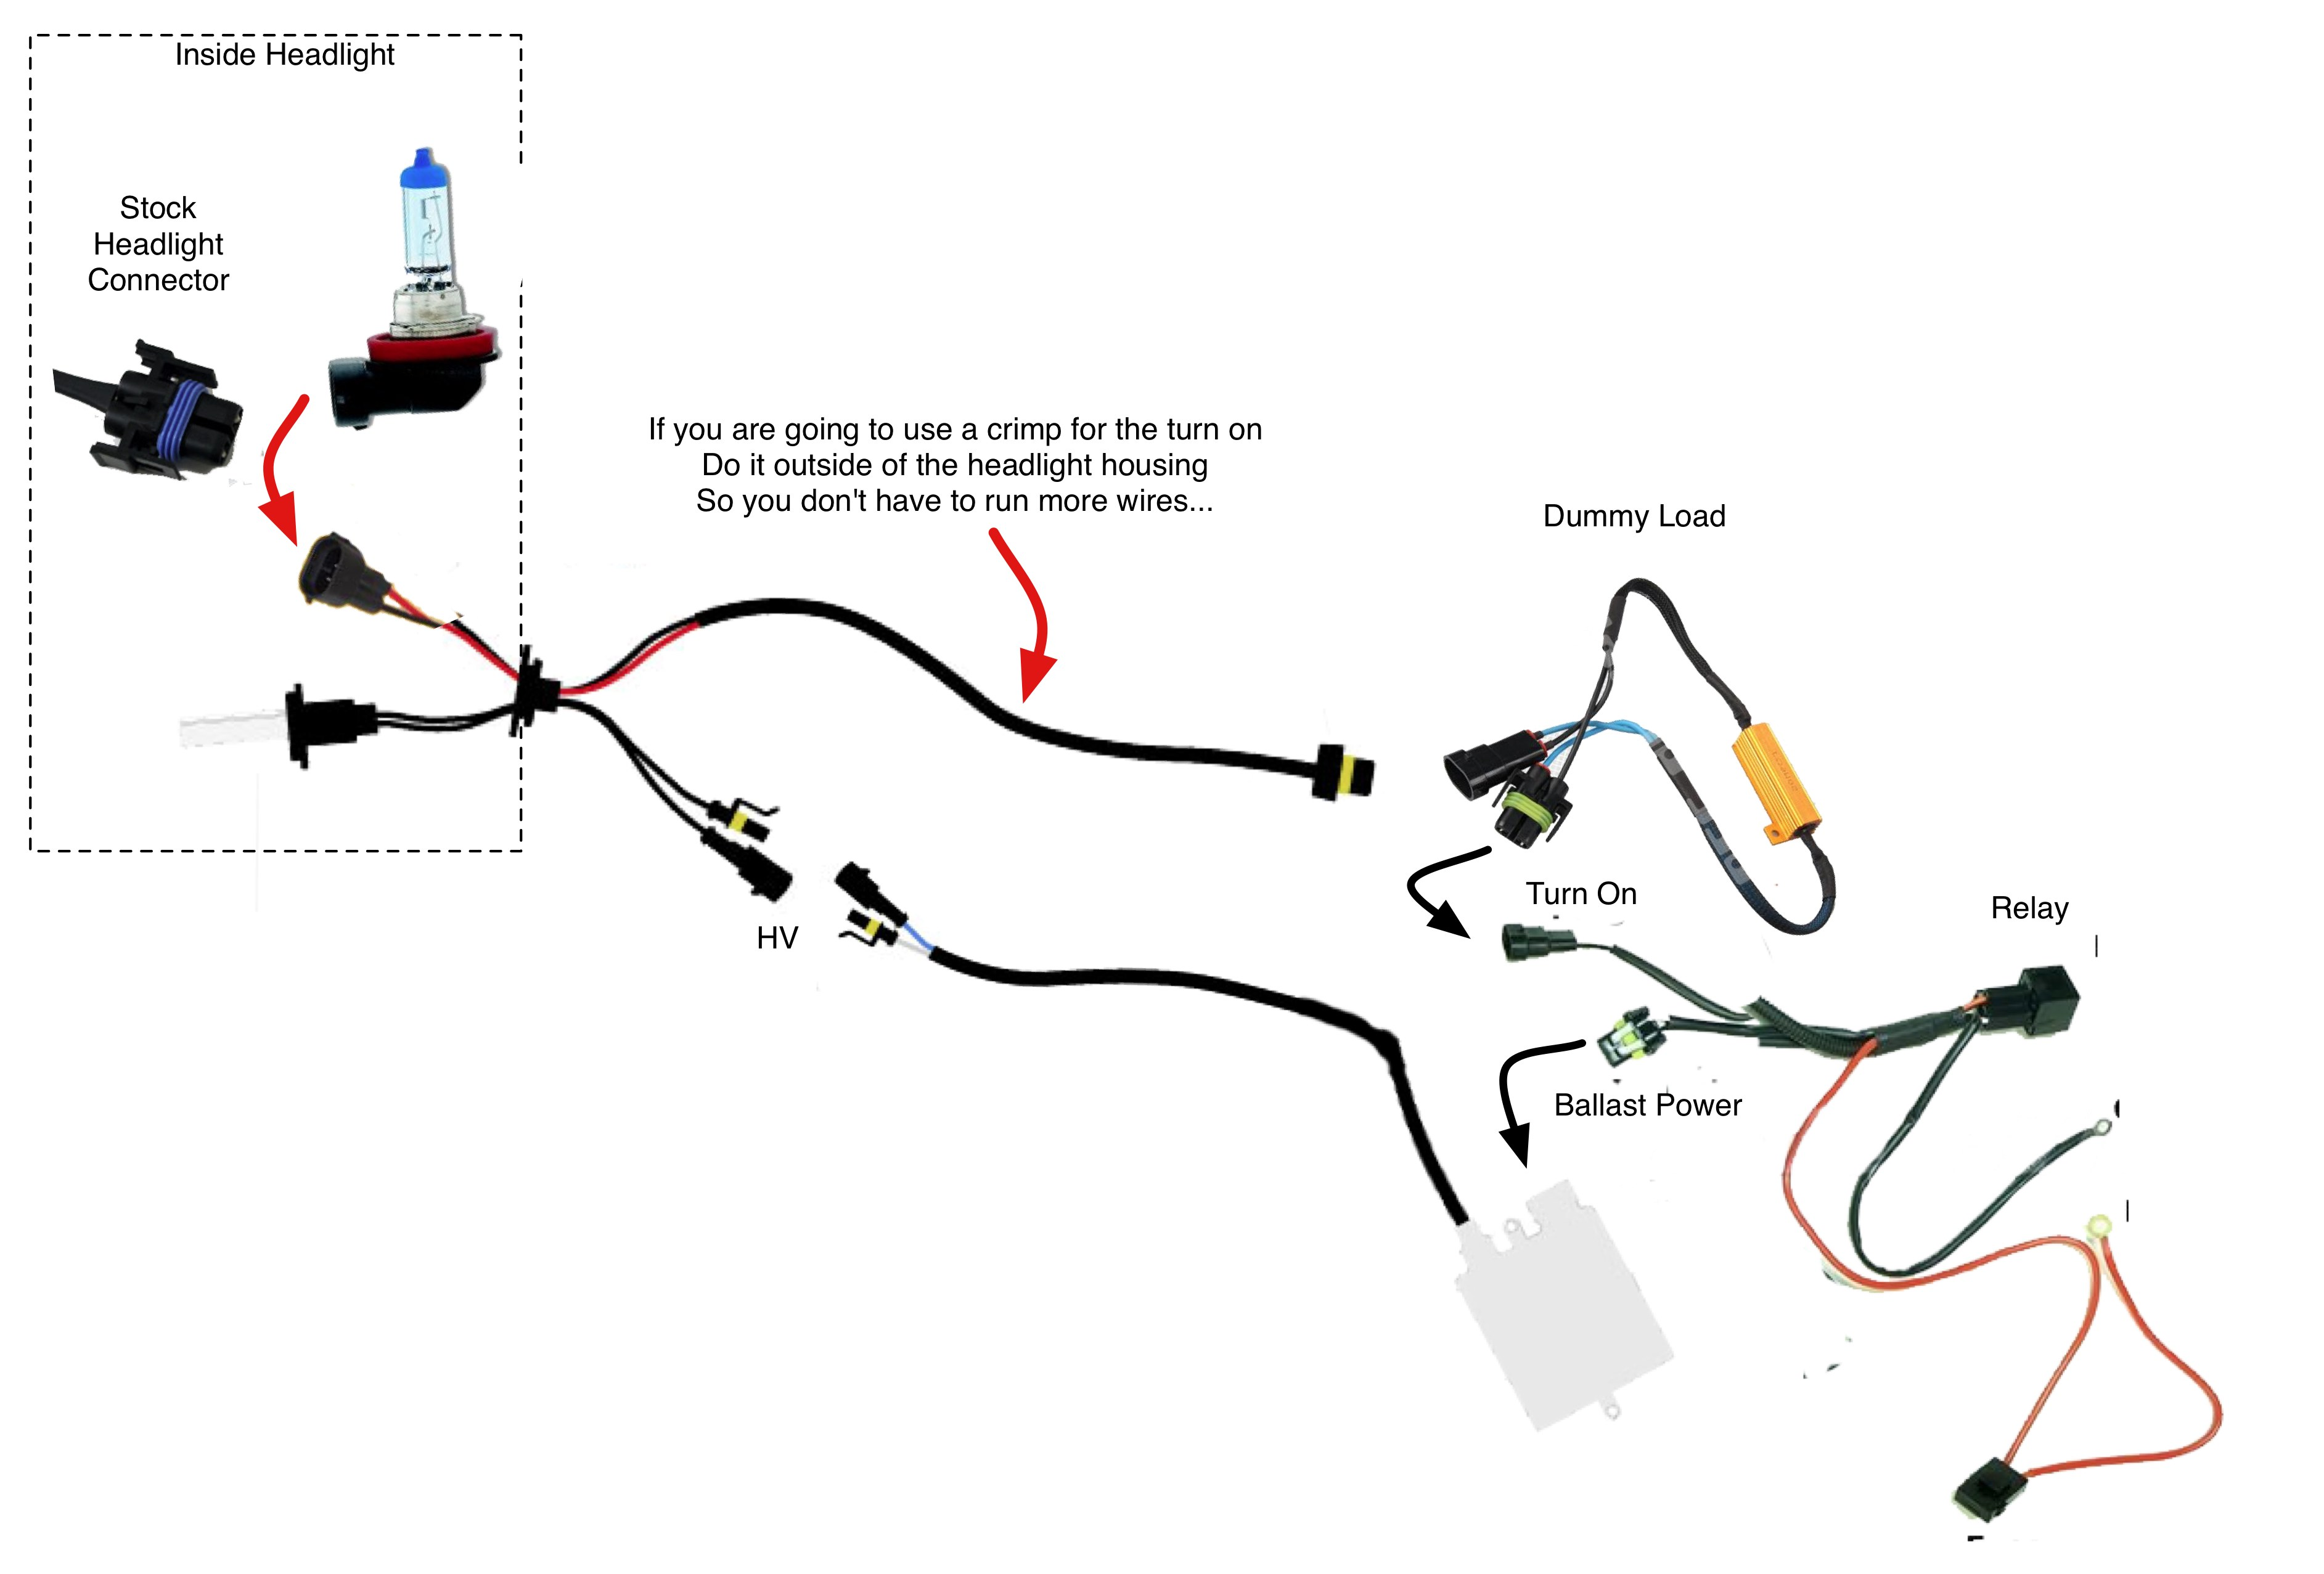 relayharness?resize=665%2C451 1998 volvo v70 radio wiring diagram wiring diagram,1998 Volvo V70 Radio Wiring Diagrams